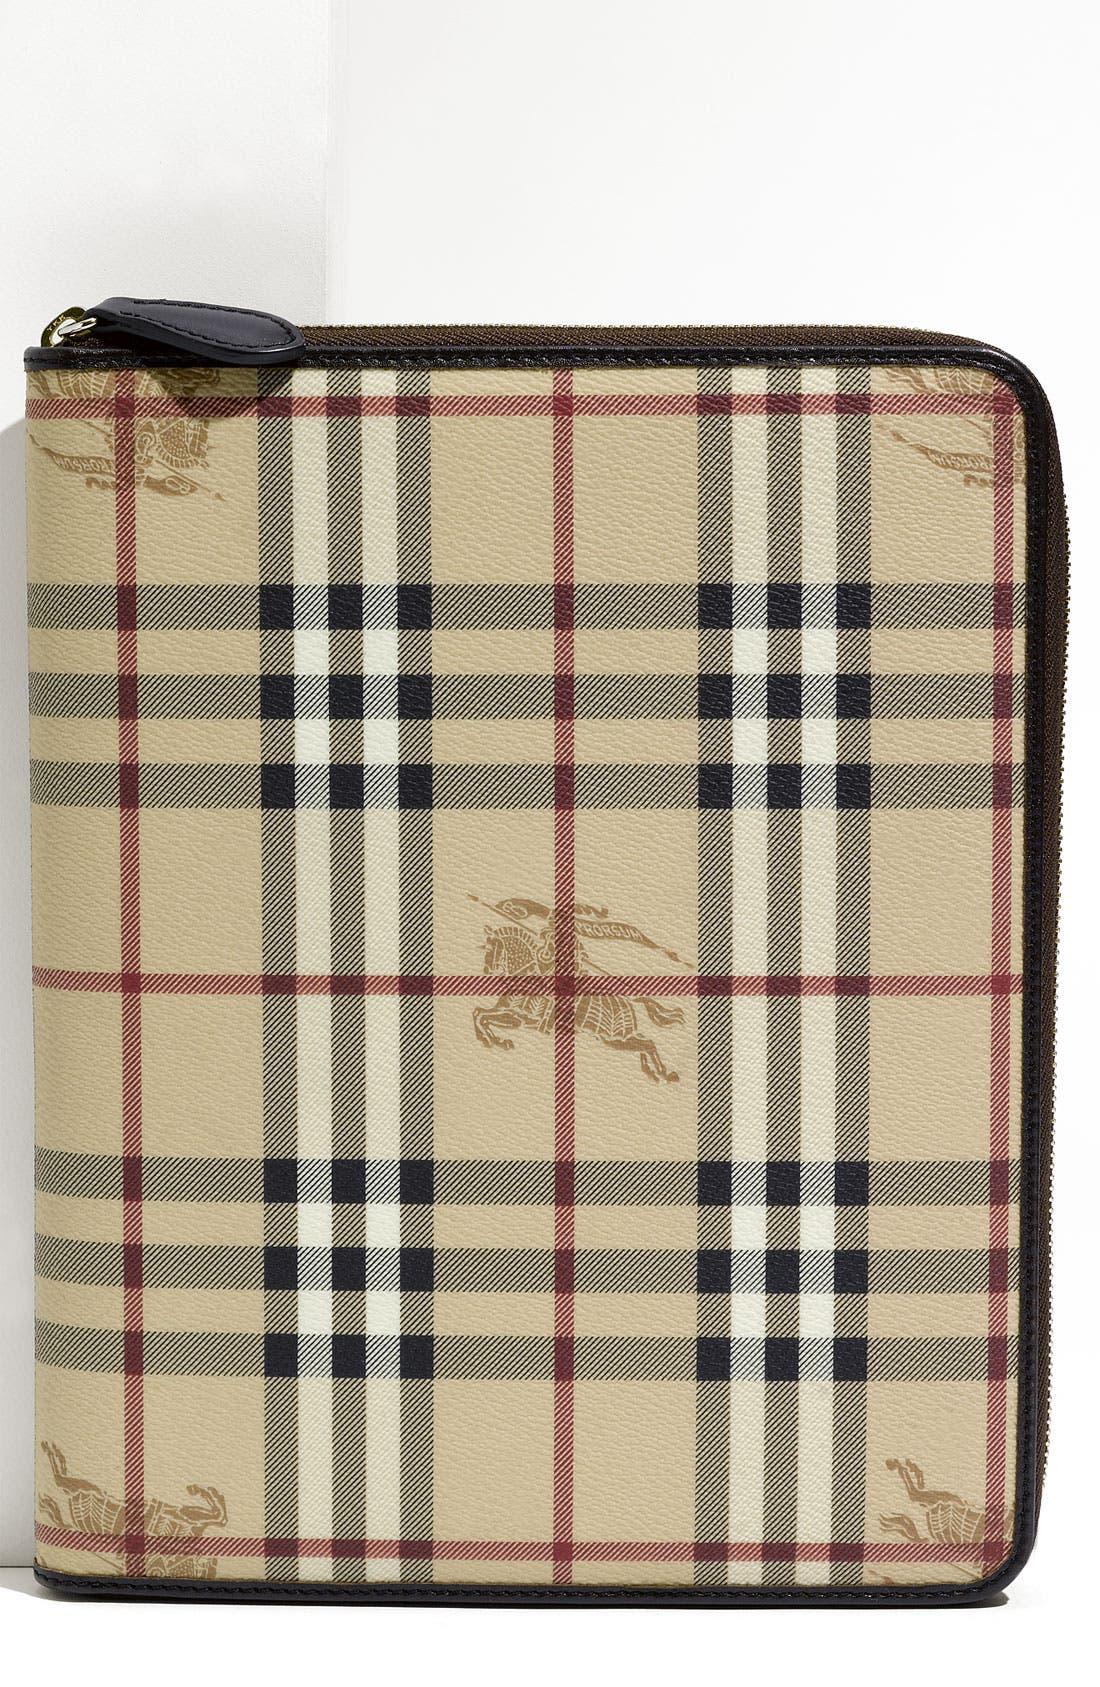 Main Image - Burberry 'Haymarket Check' Zip Around iPad 2 Case